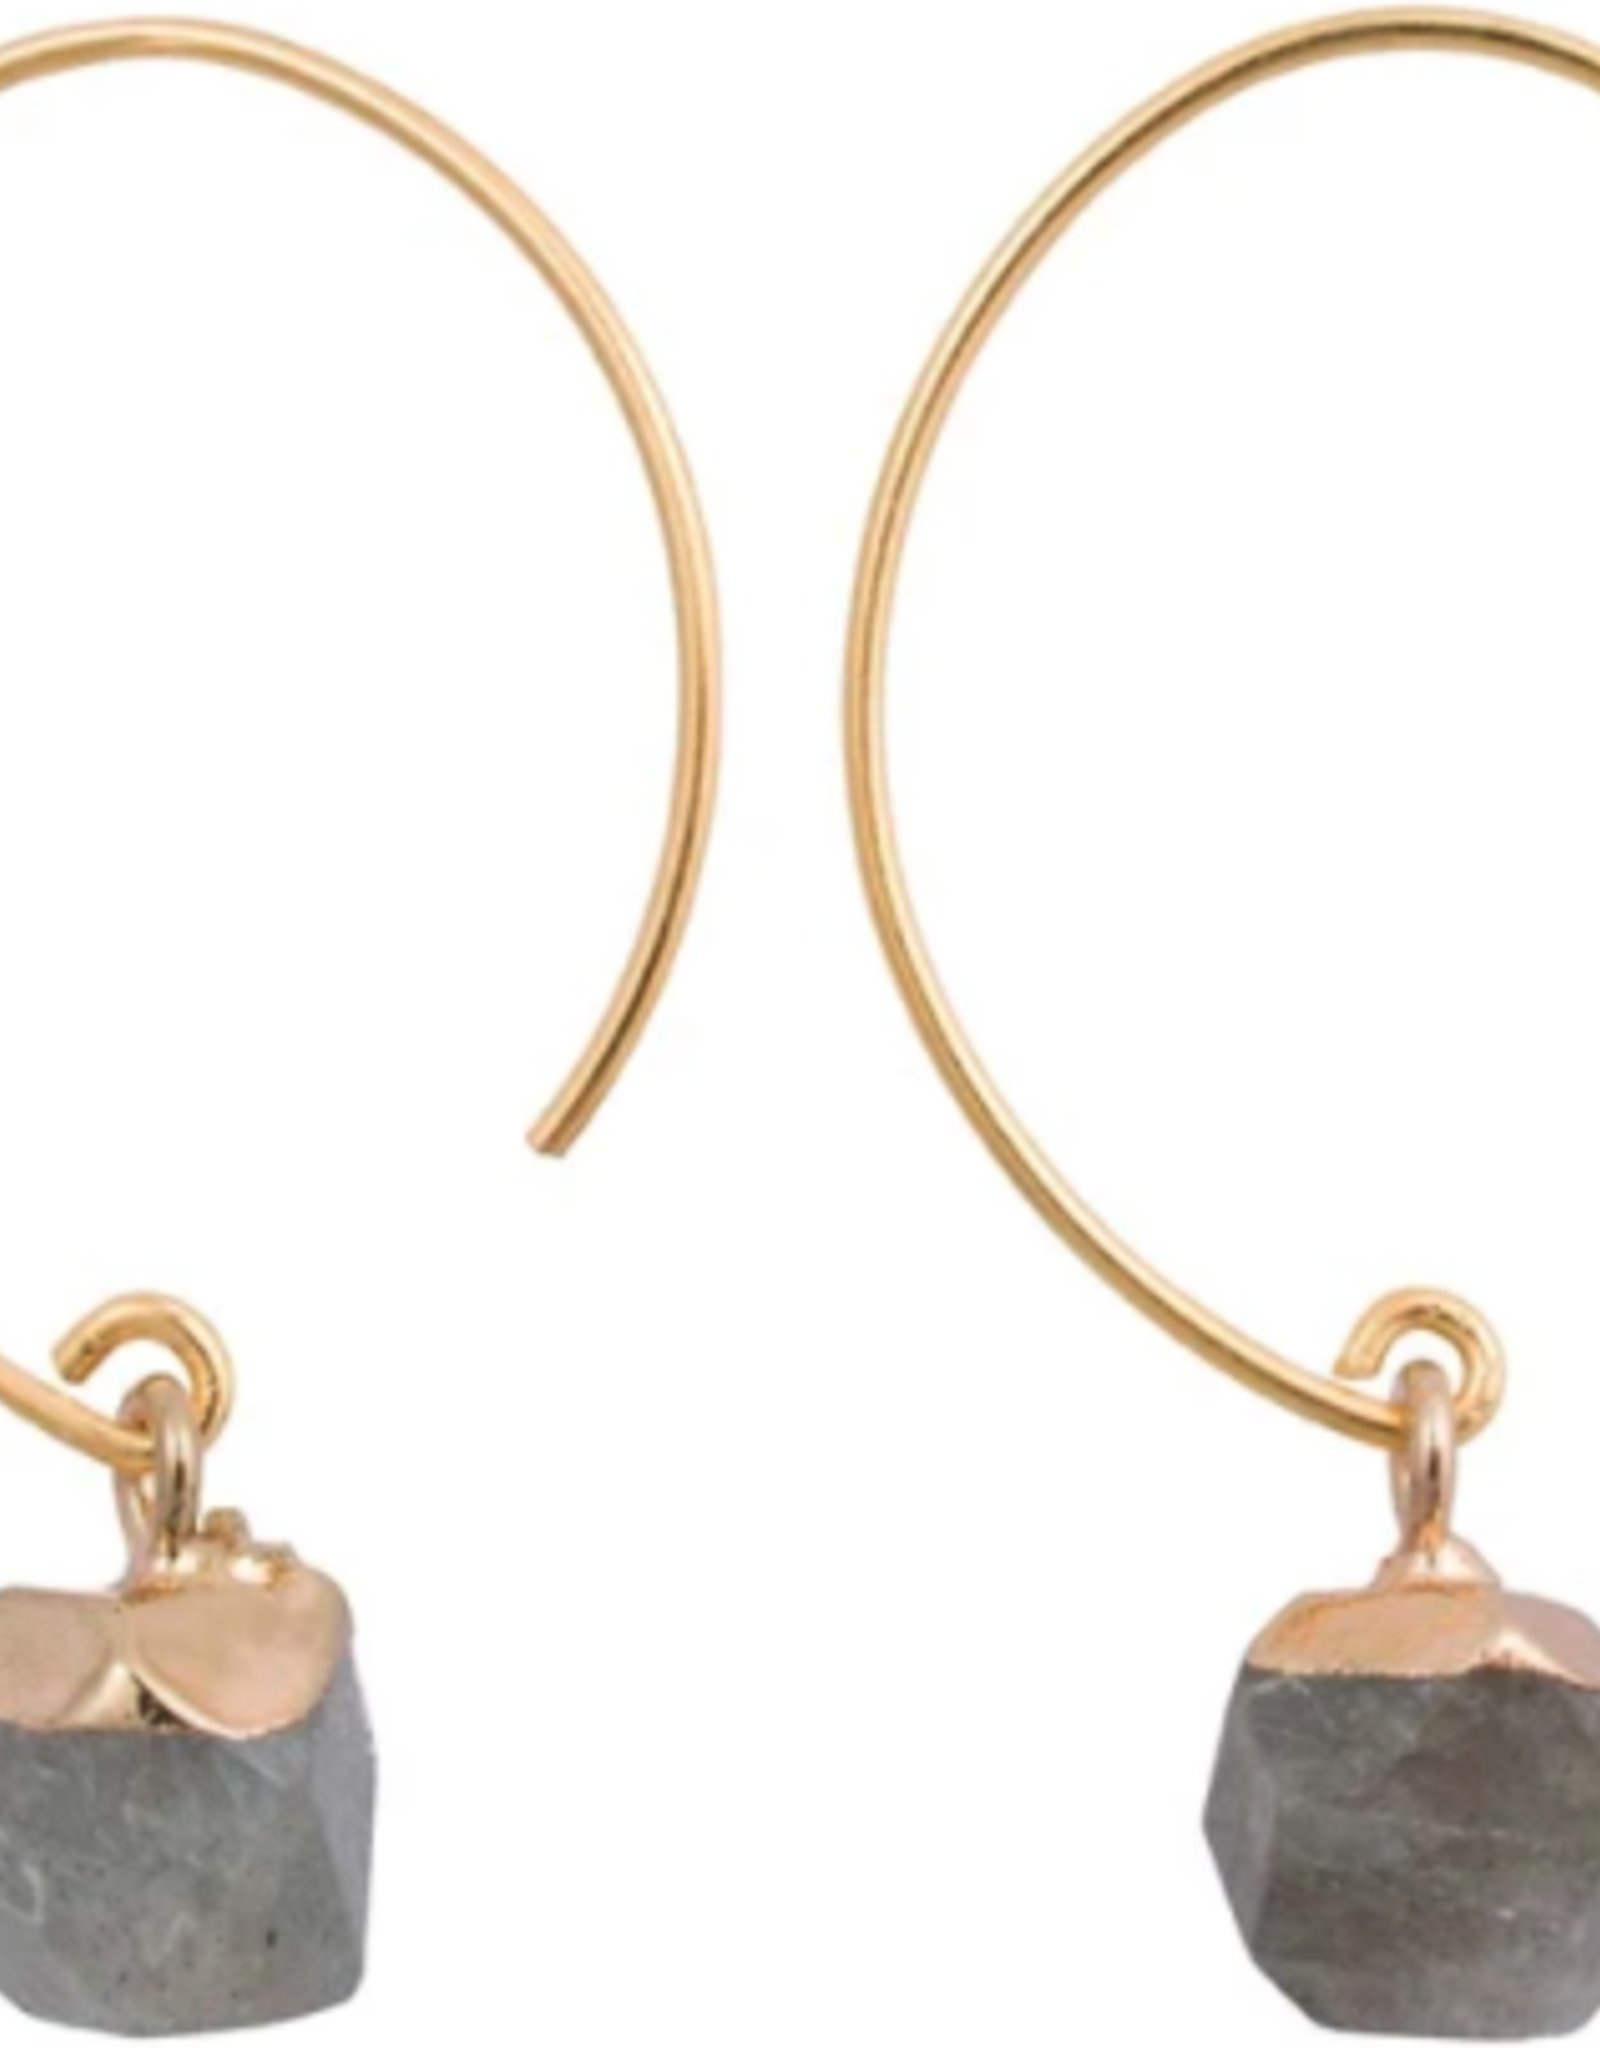 Chic Brass and Stone Earrings, Jasper